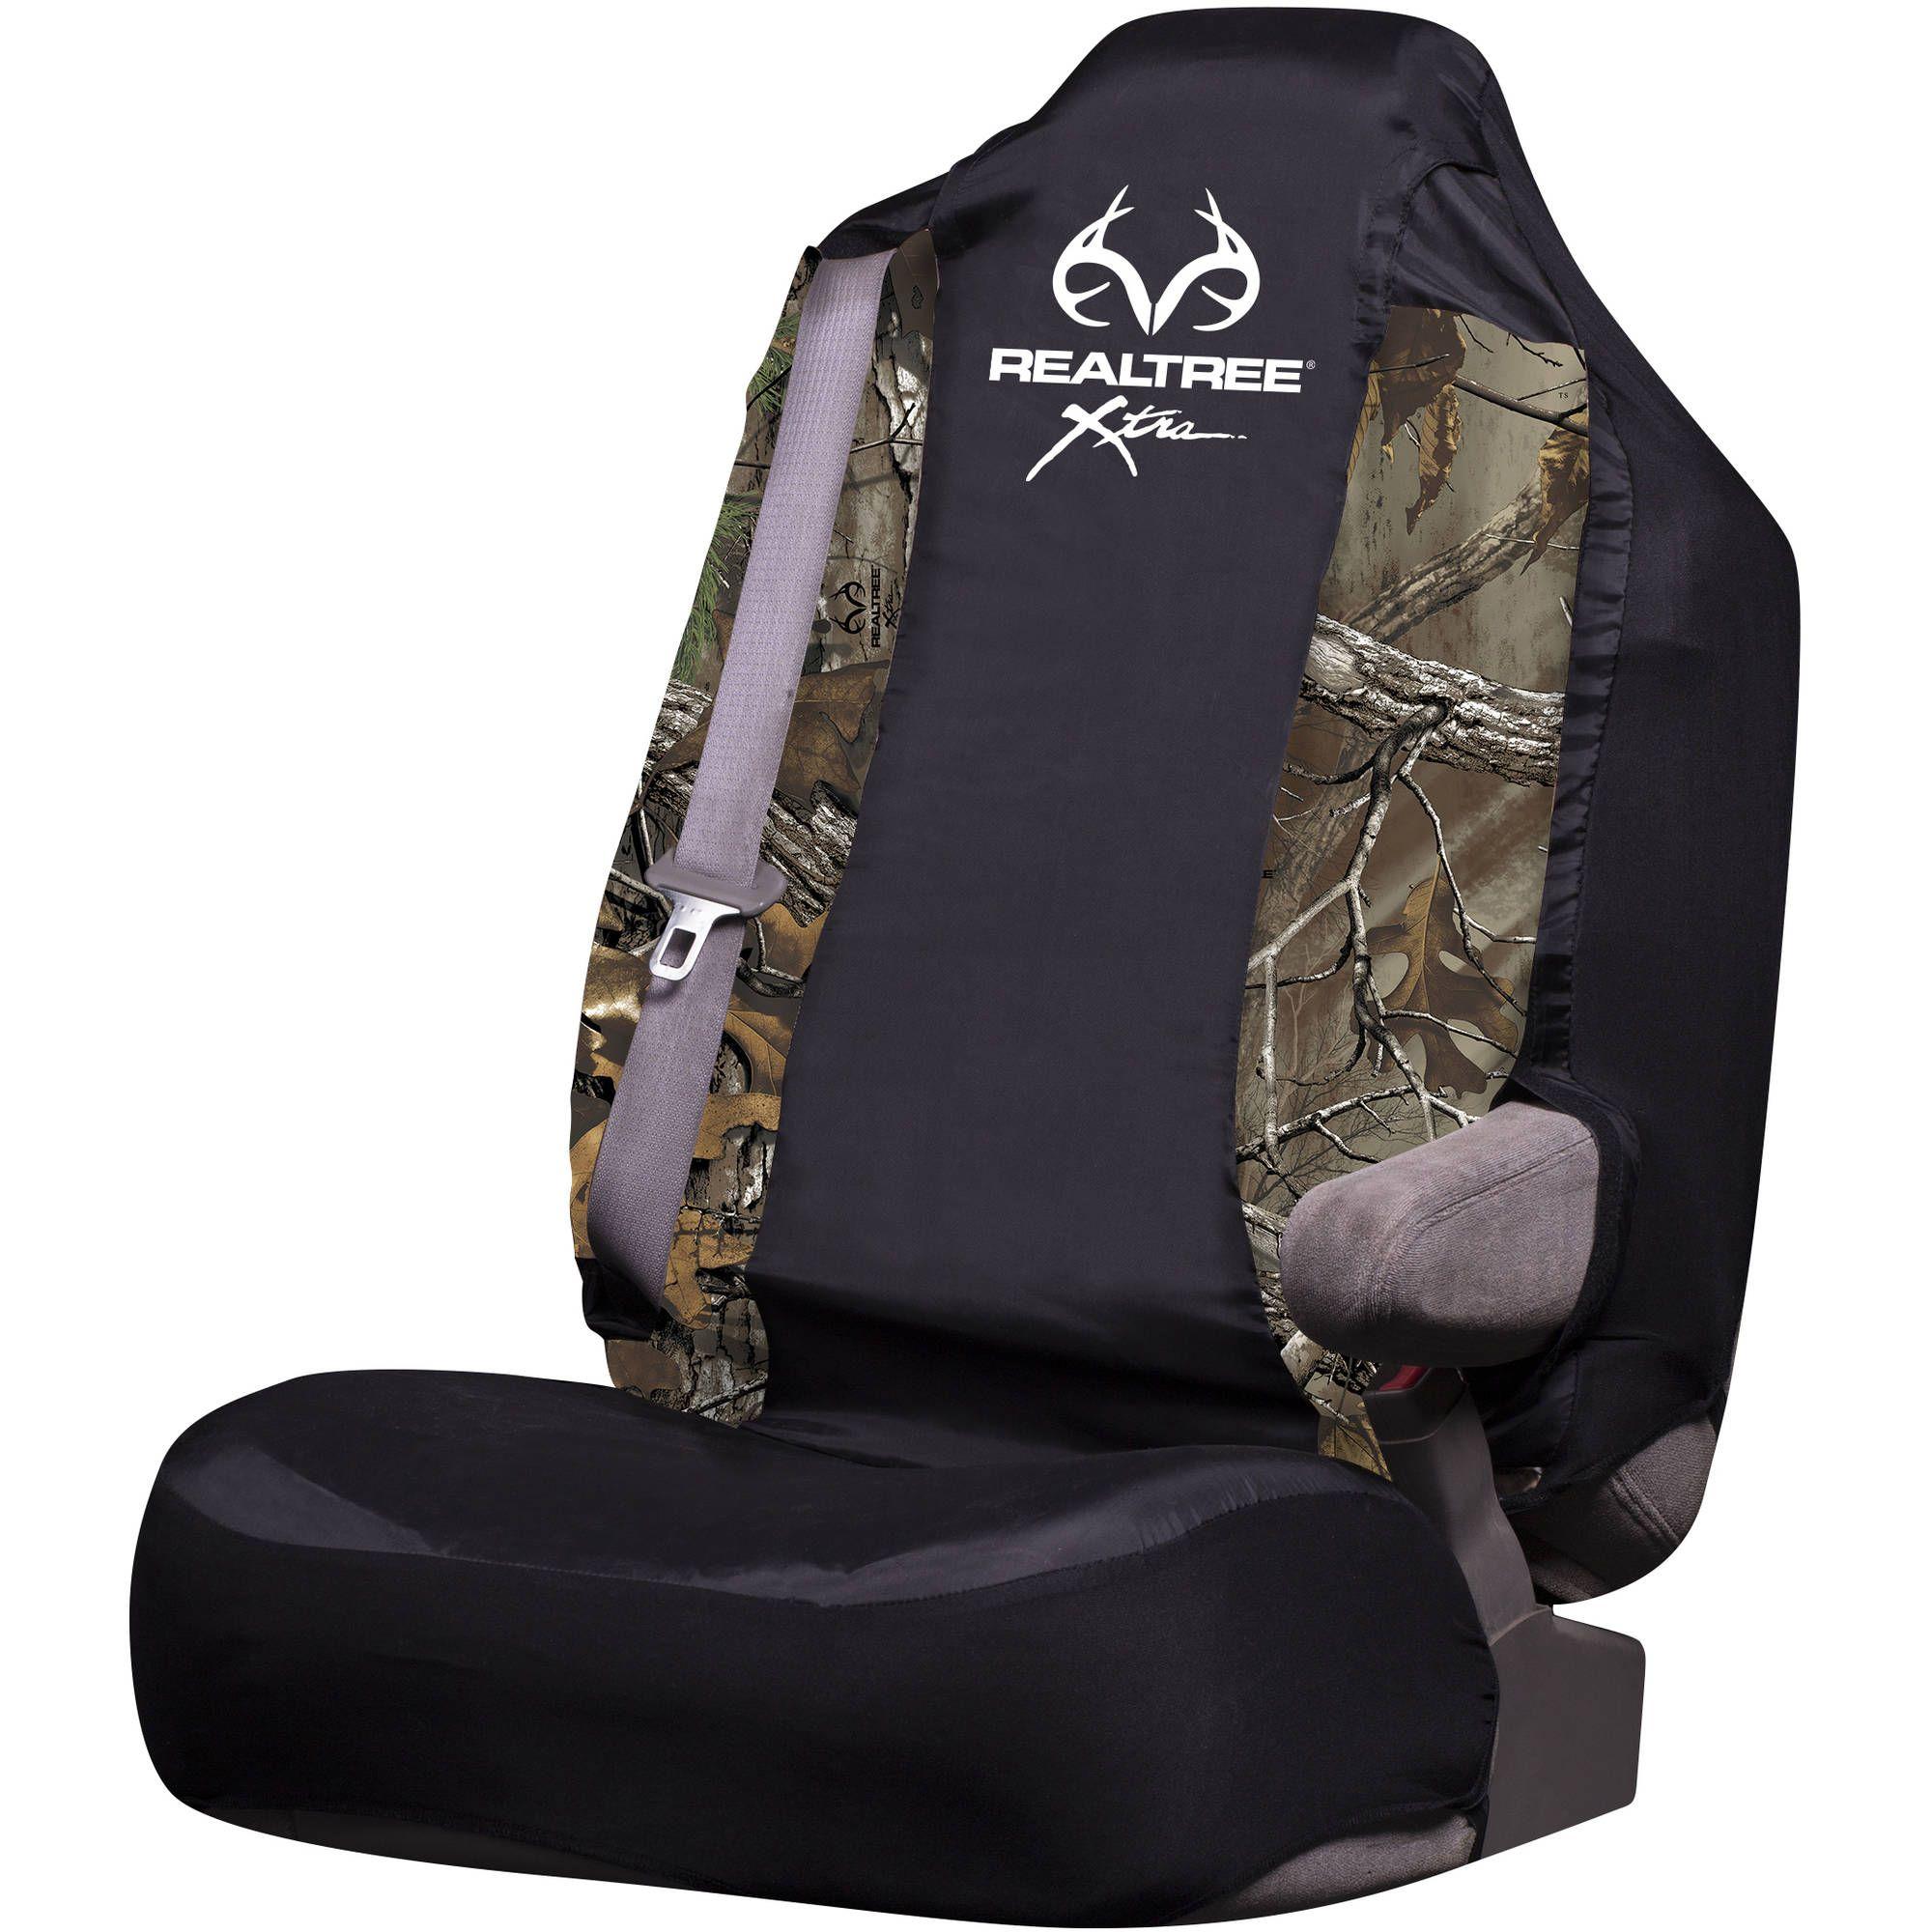 Astounding Realtree Xtra Camo Universal Seat Cover Walmart Com Alphanode Cool Chair Designs And Ideas Alphanodeonline